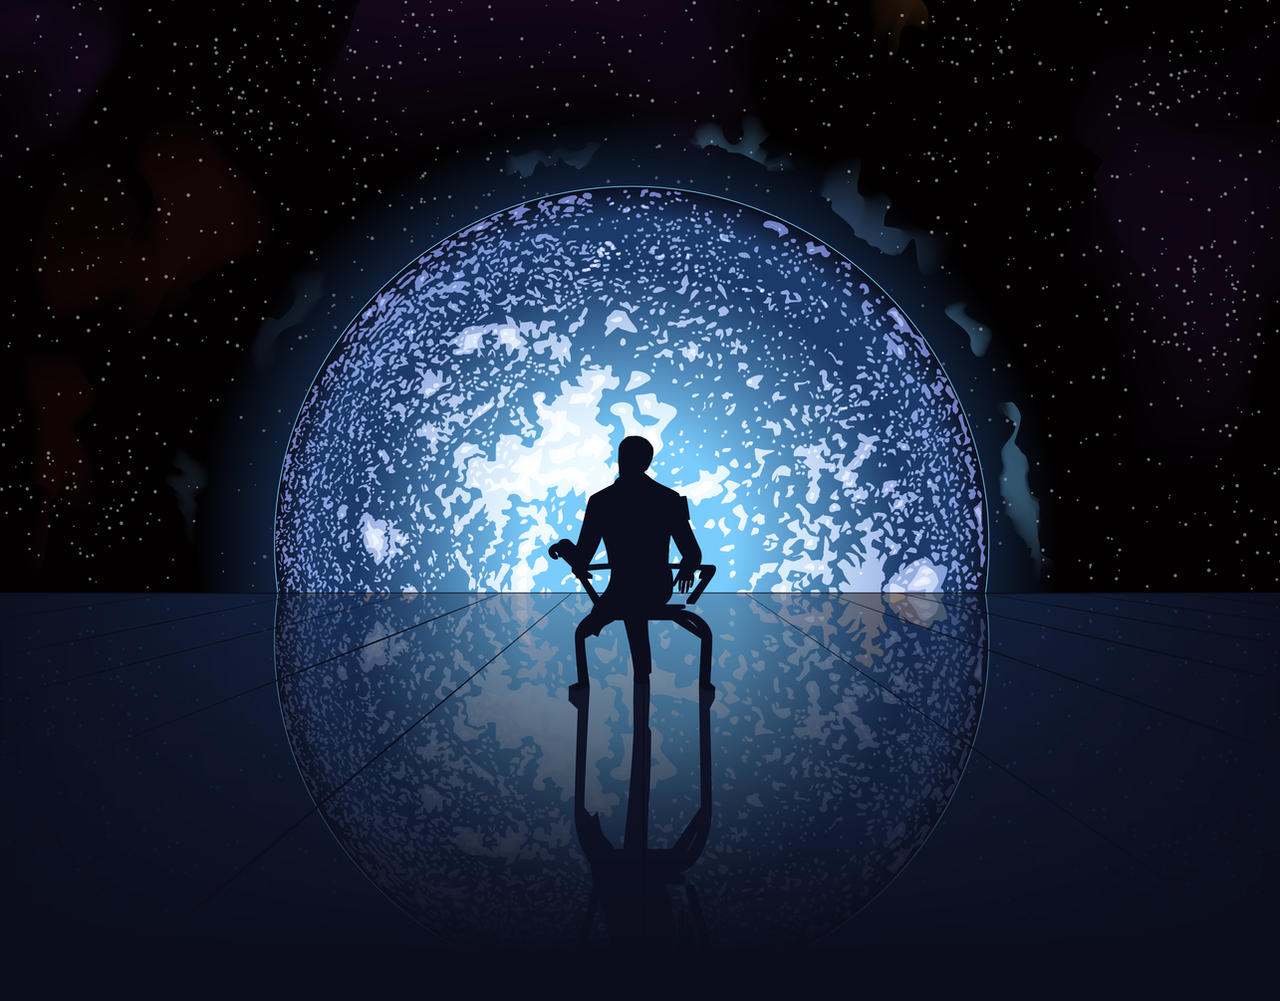 Mass Effect Illusive Man Paragon